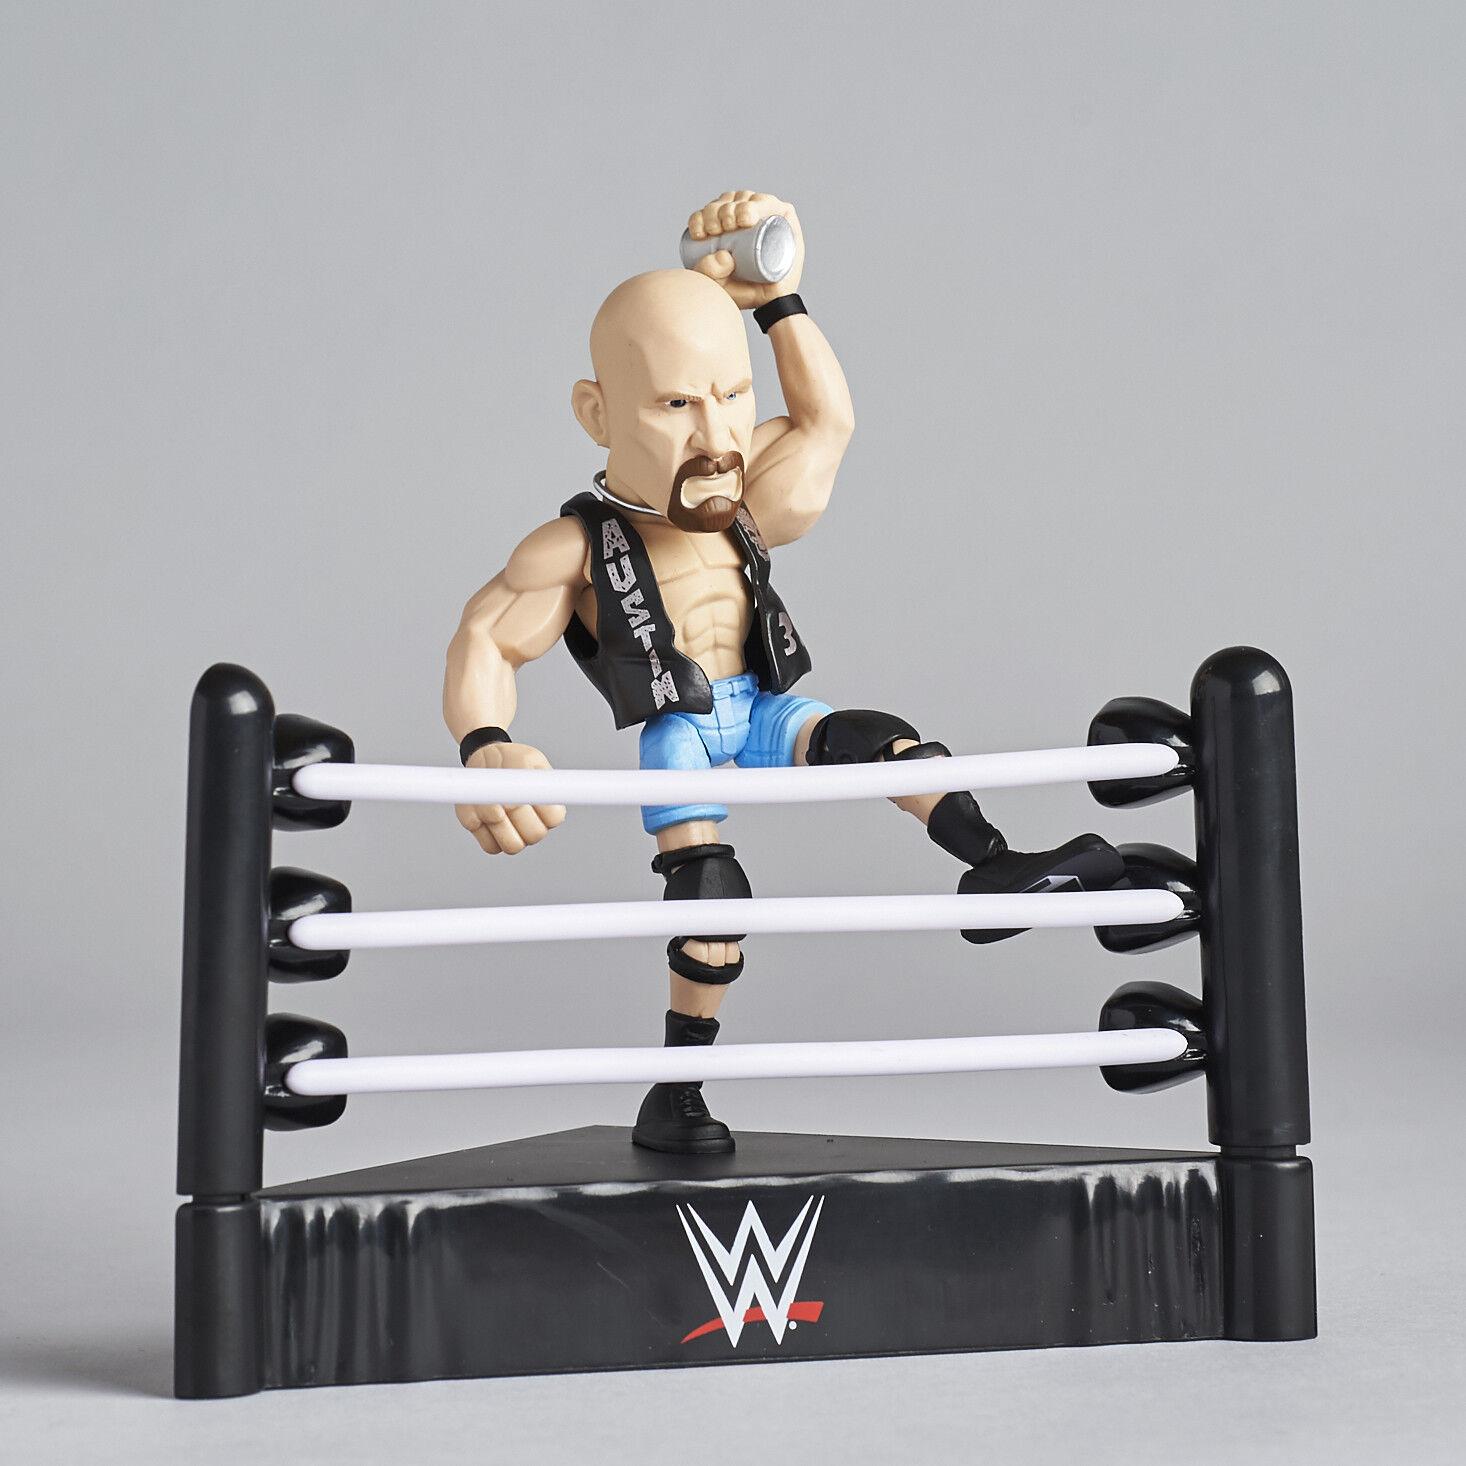 Stone Cold Steve Austin Slam Stars Exclusive Figure Loot Crate Exclusive Stars WWE Attitude Era c2e5cc